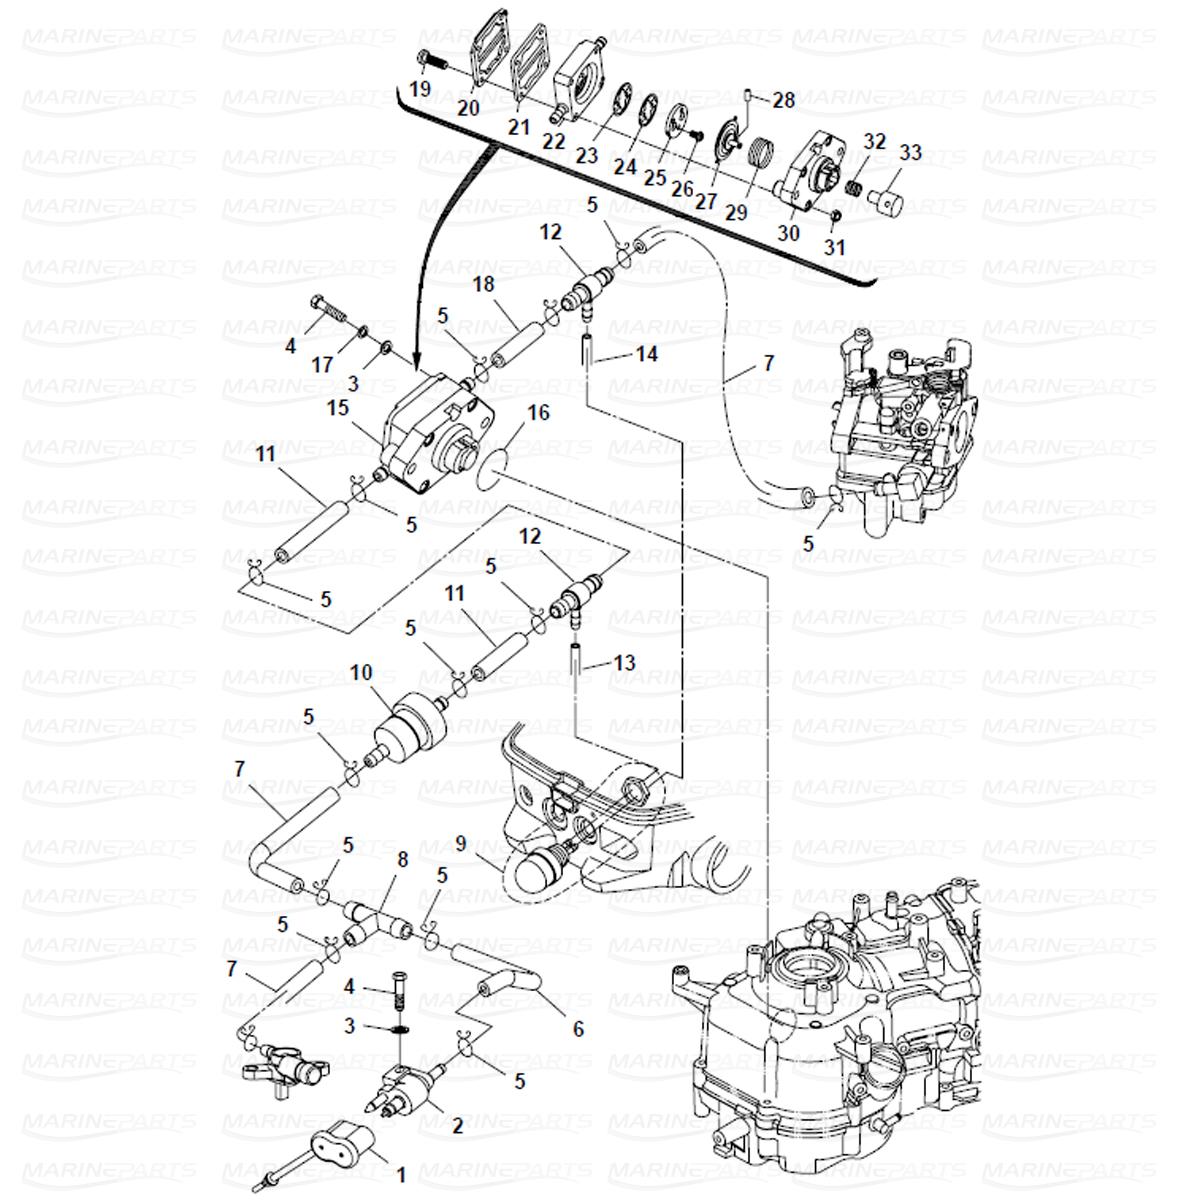 Sprängskiss bränslesystem, Parsun 6 hk